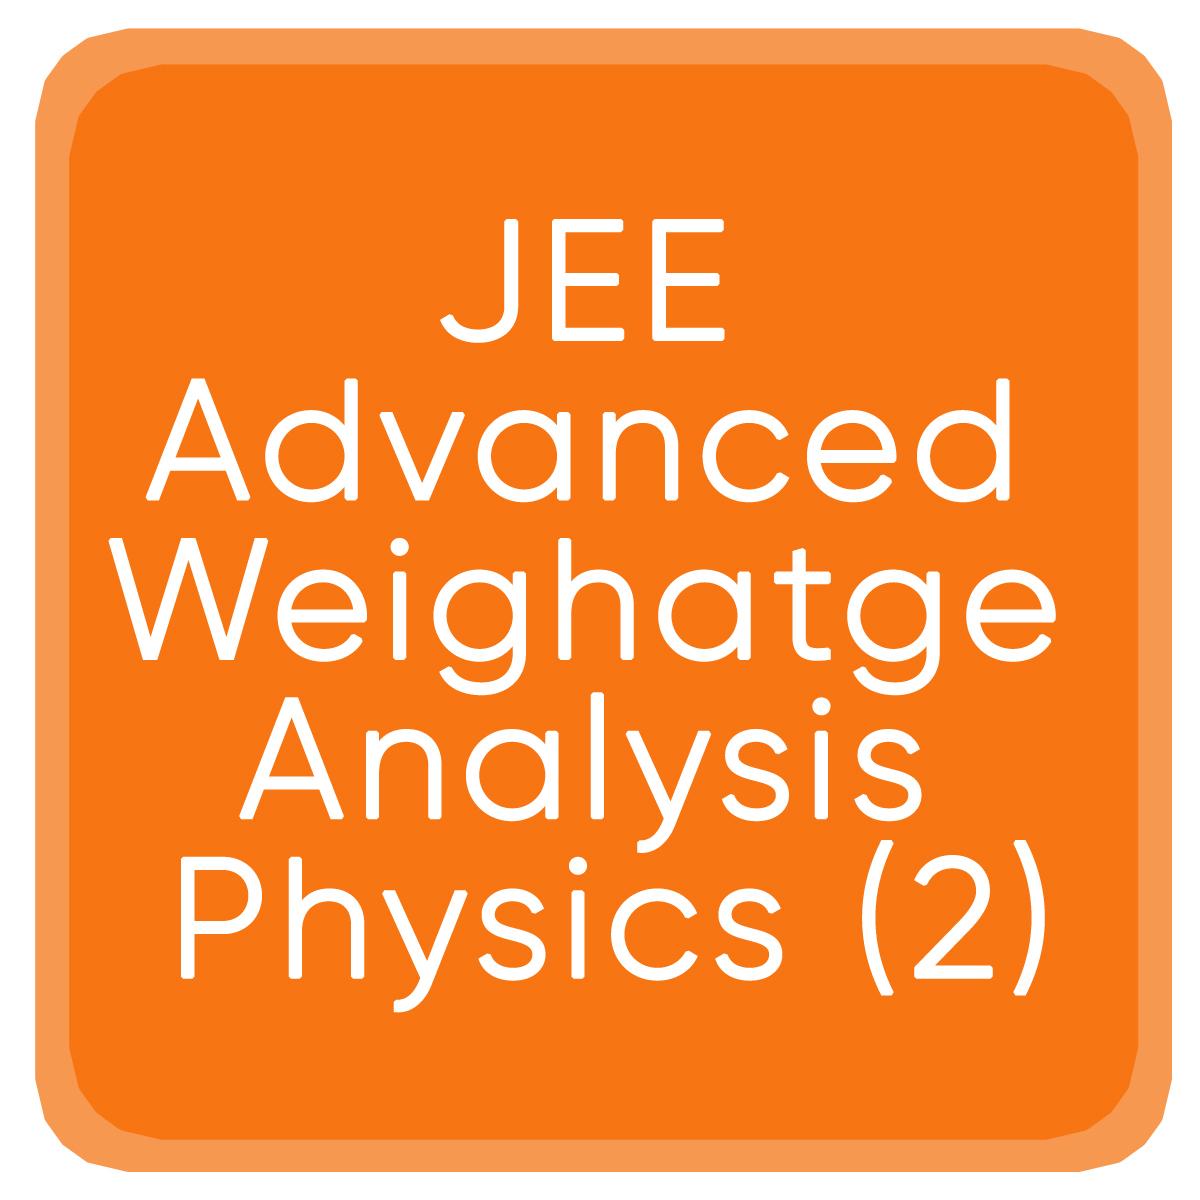 Jee Advanced Weighatge Analysis Physics (2)